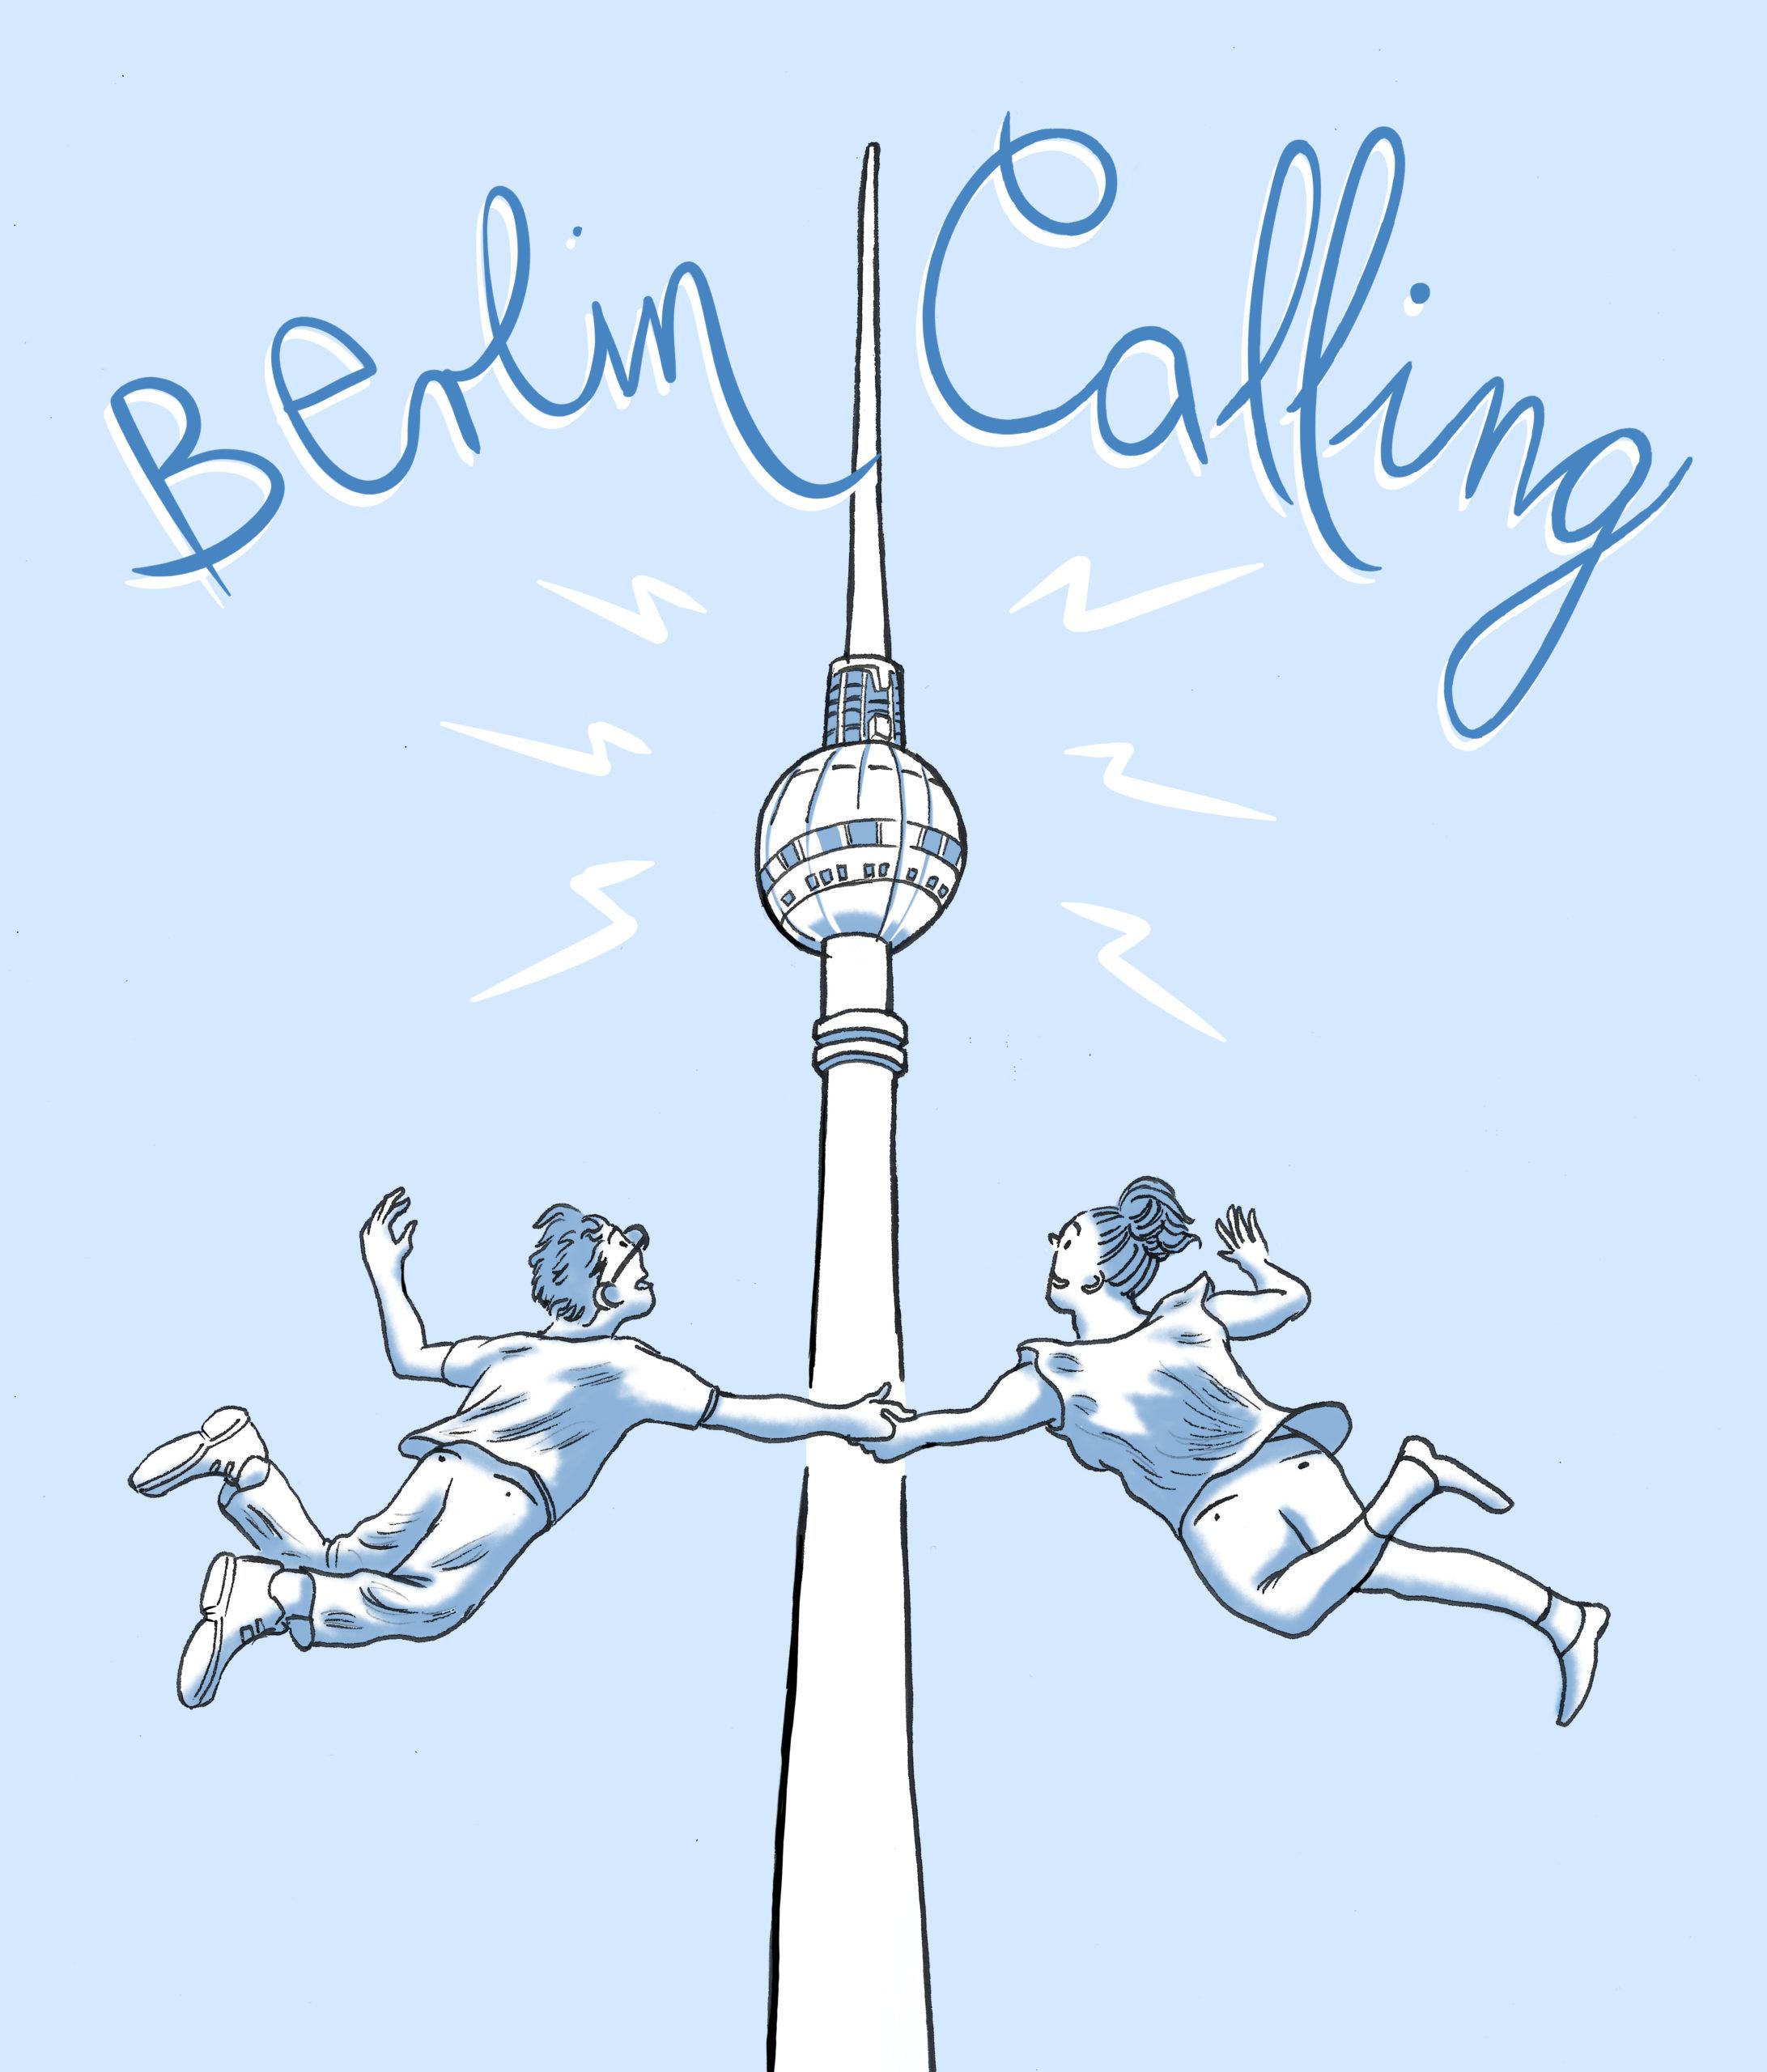 Berlin_Calling_1